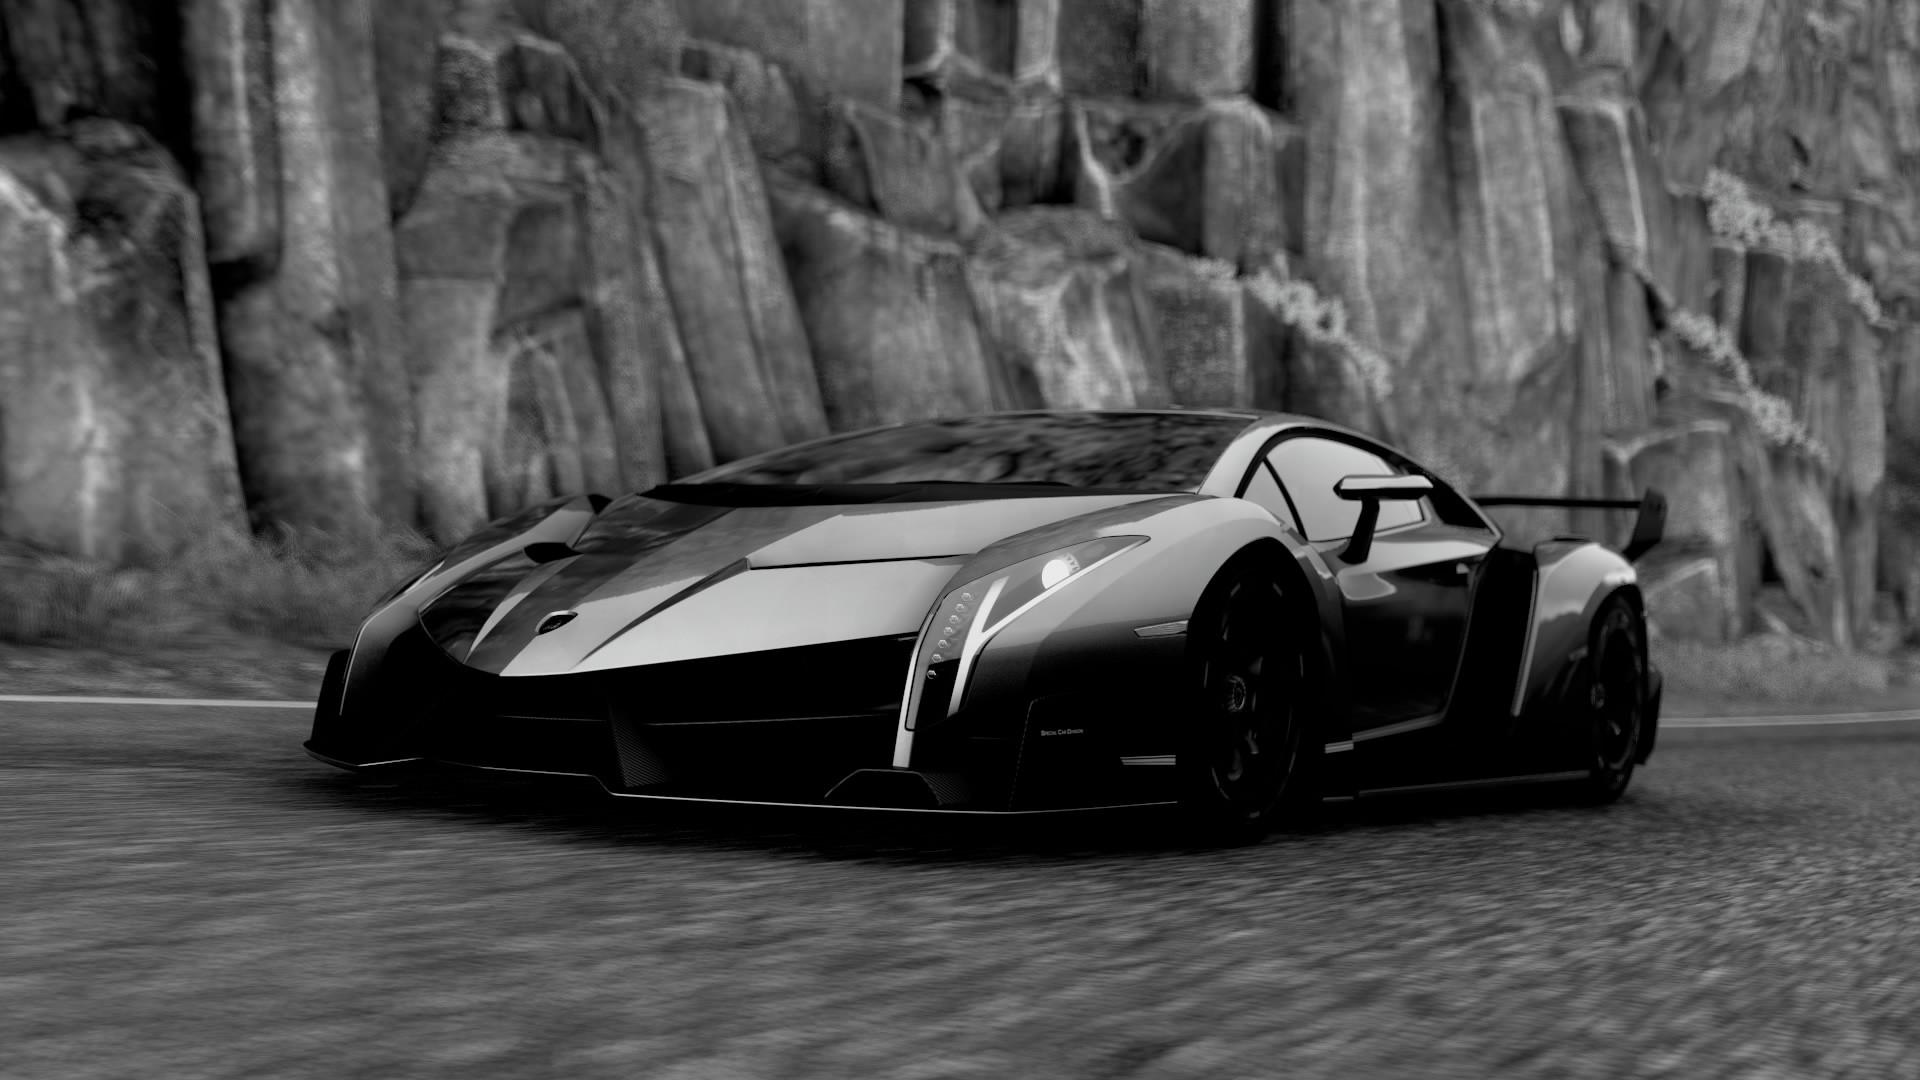 Wallpaper 1920x1080 Px Car Driveclub Lamborghini Veneno